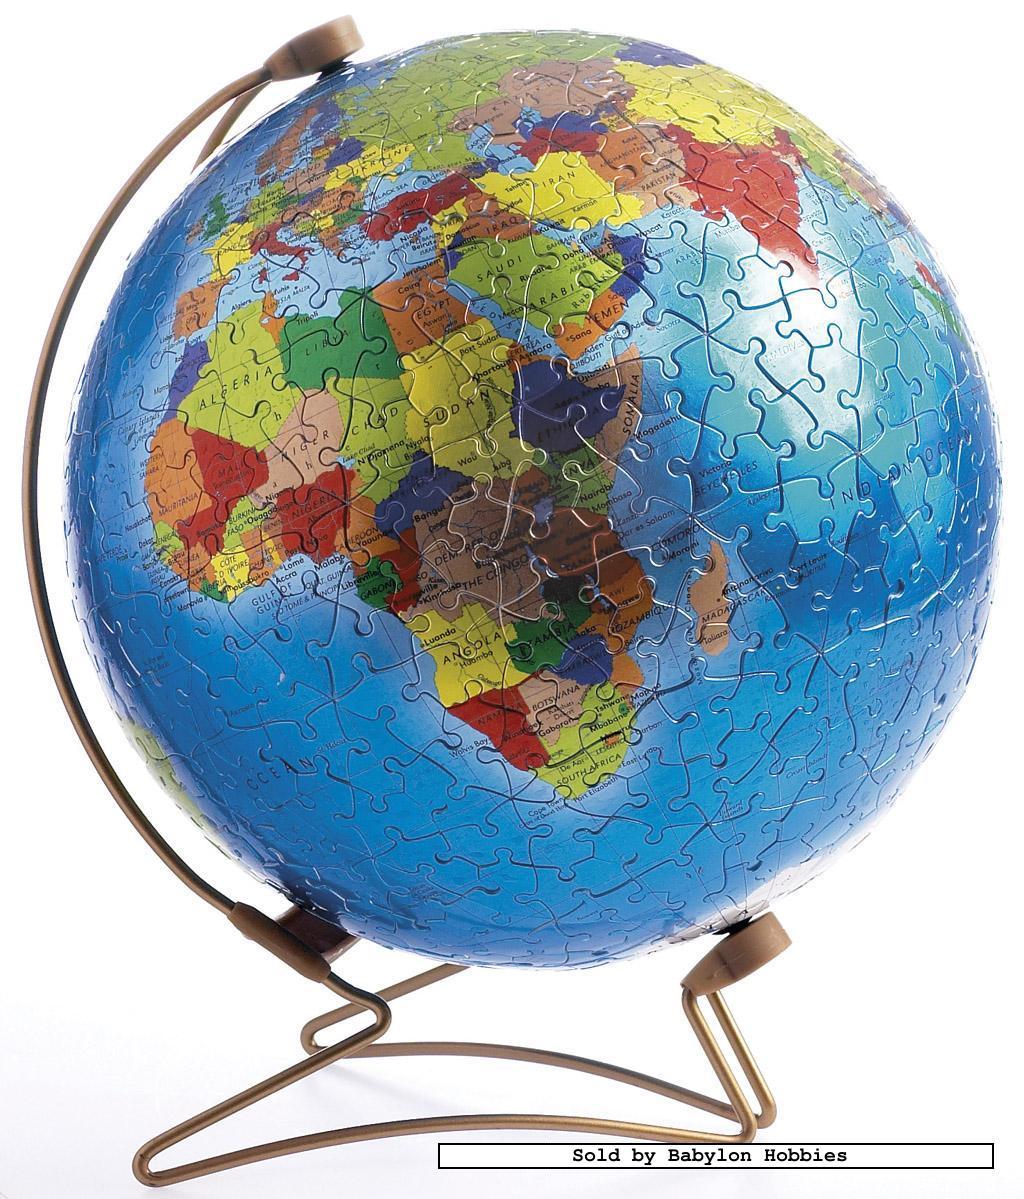 540 pcs jigsaw puzzle puzzleball the earth metallic maps. Black Bedroom Furniture Sets. Home Design Ideas